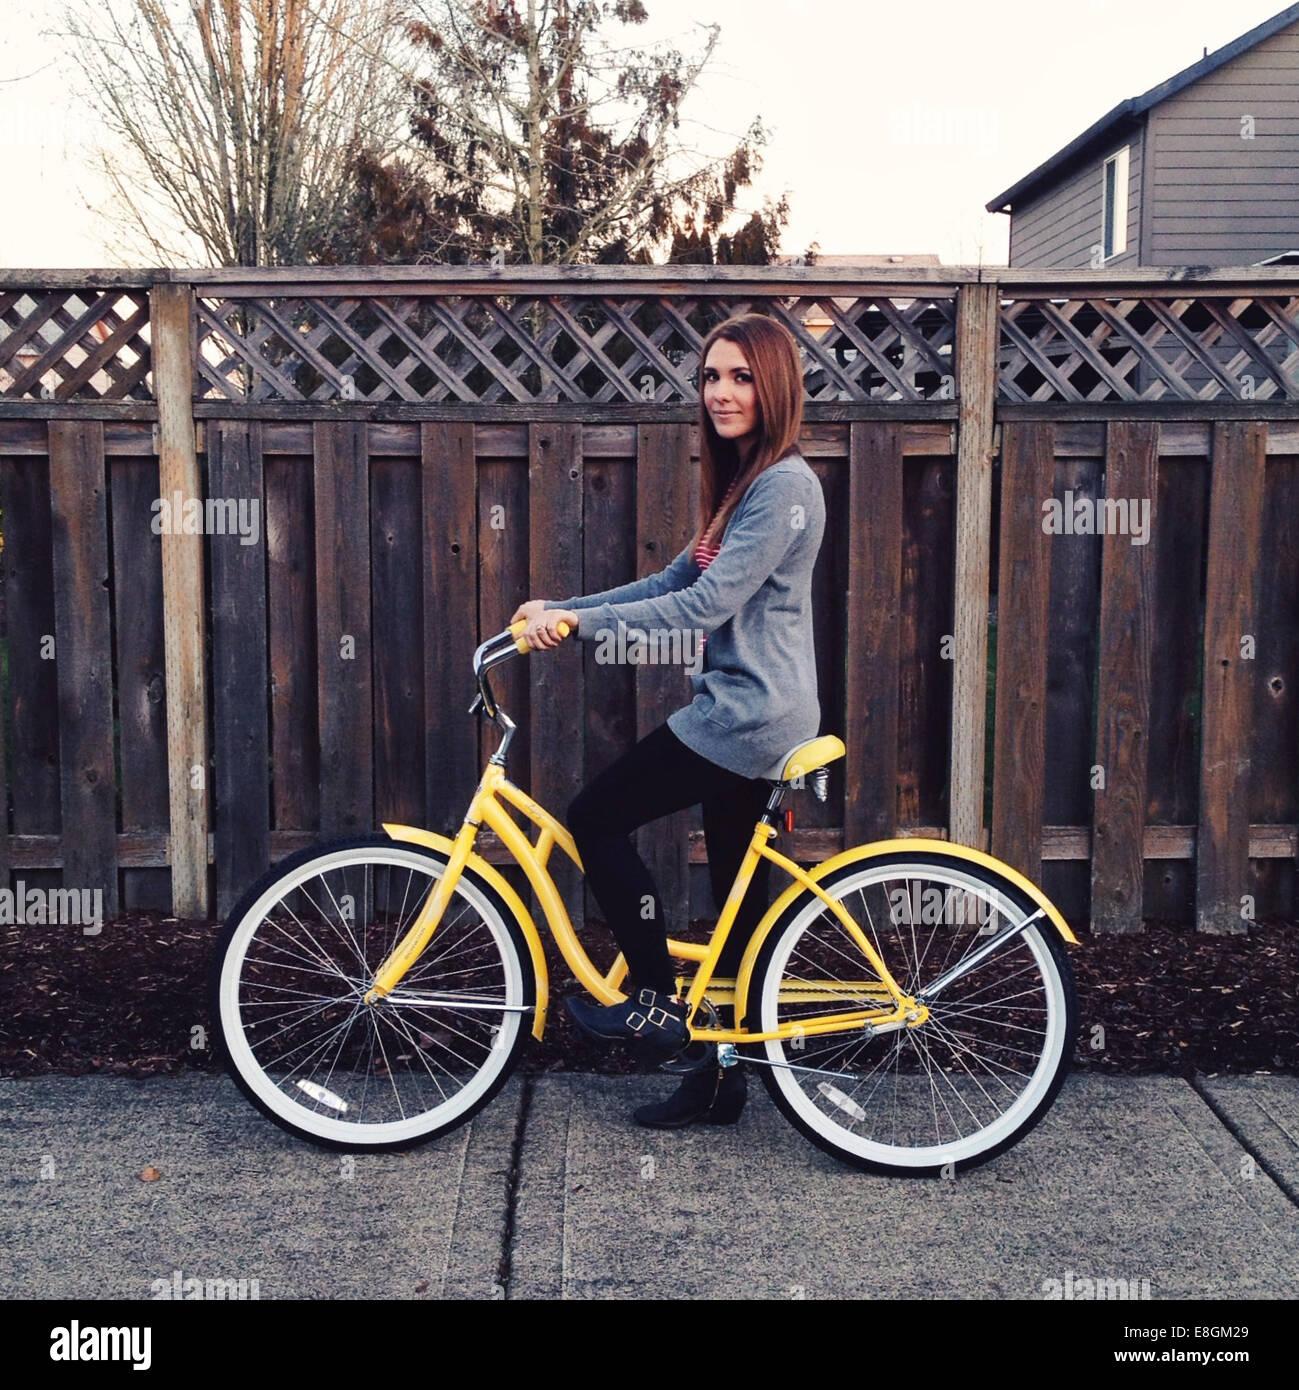 USA, Oregon, Portland, Multnomah County Porträt der jungen Frau auf dem Fahrrad Stockbild